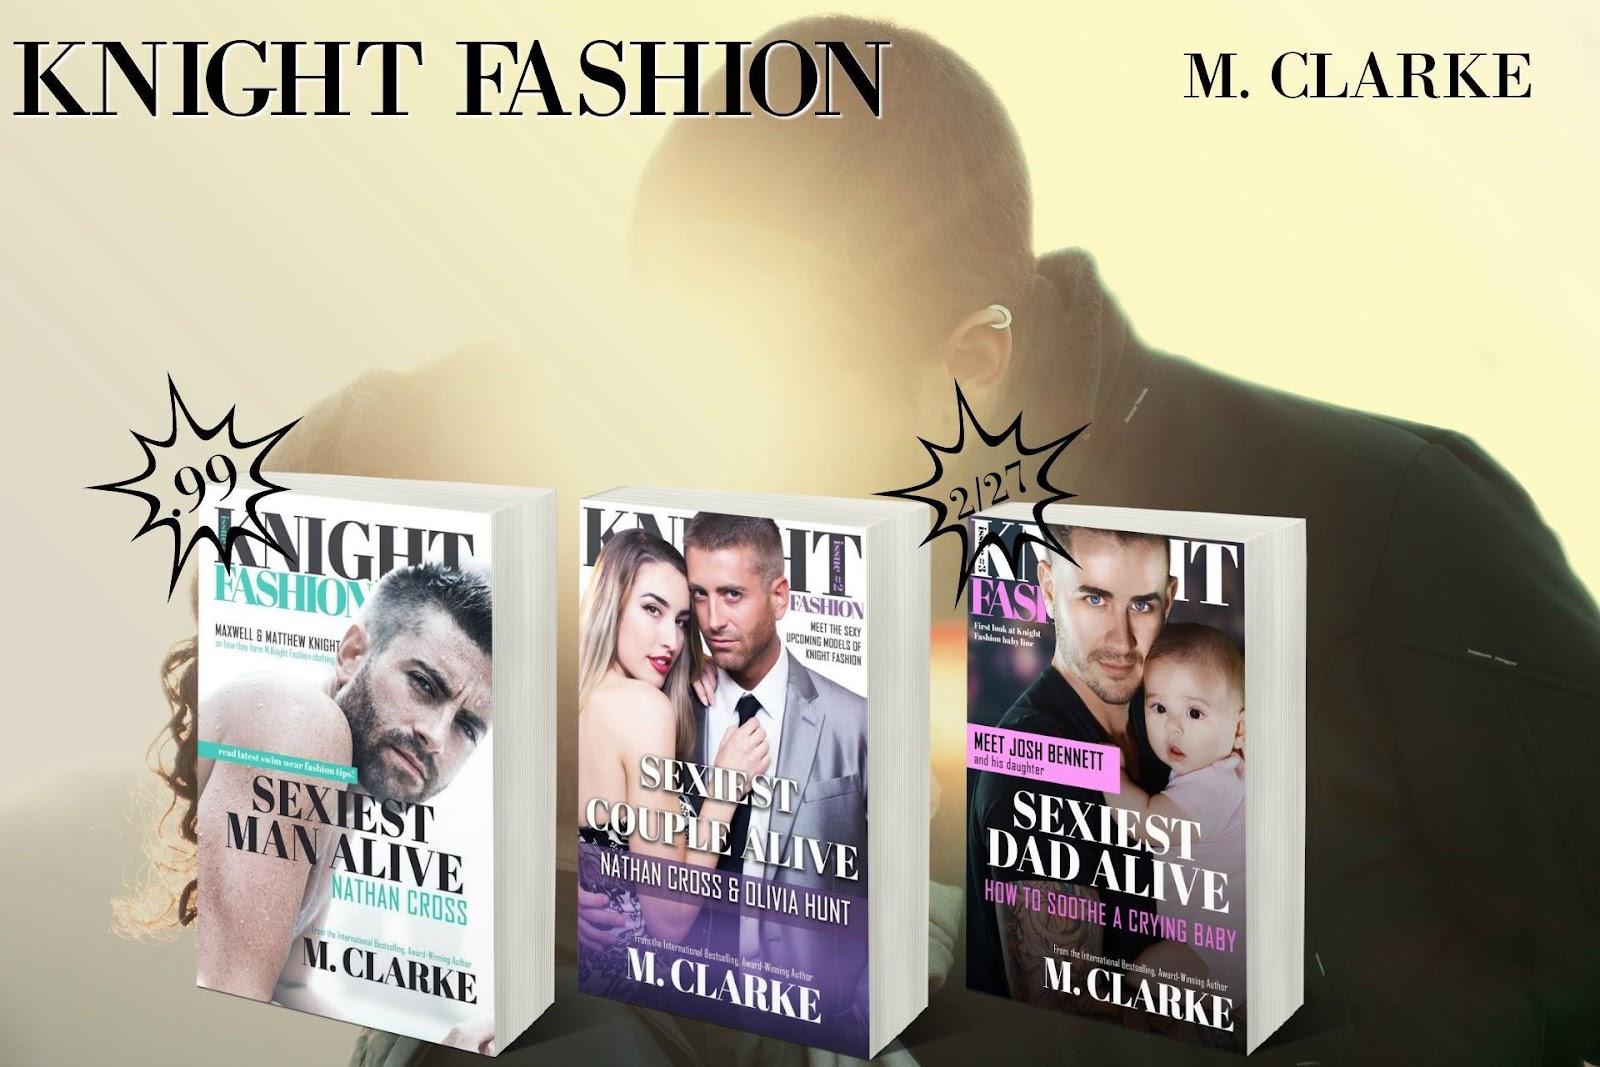 knight fashion graphic.jpg